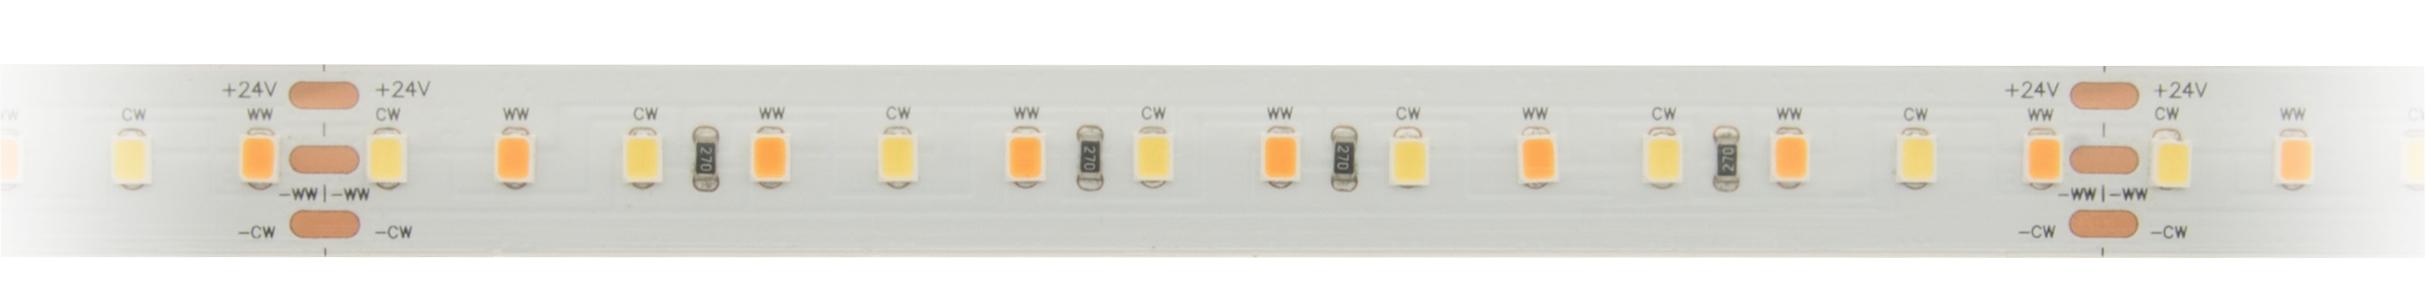 1 Stk FS 115, AW, 100% MIX, 26,9W/m, 1989lm/m, 24VDC, IP44, l=5m LIFS009400